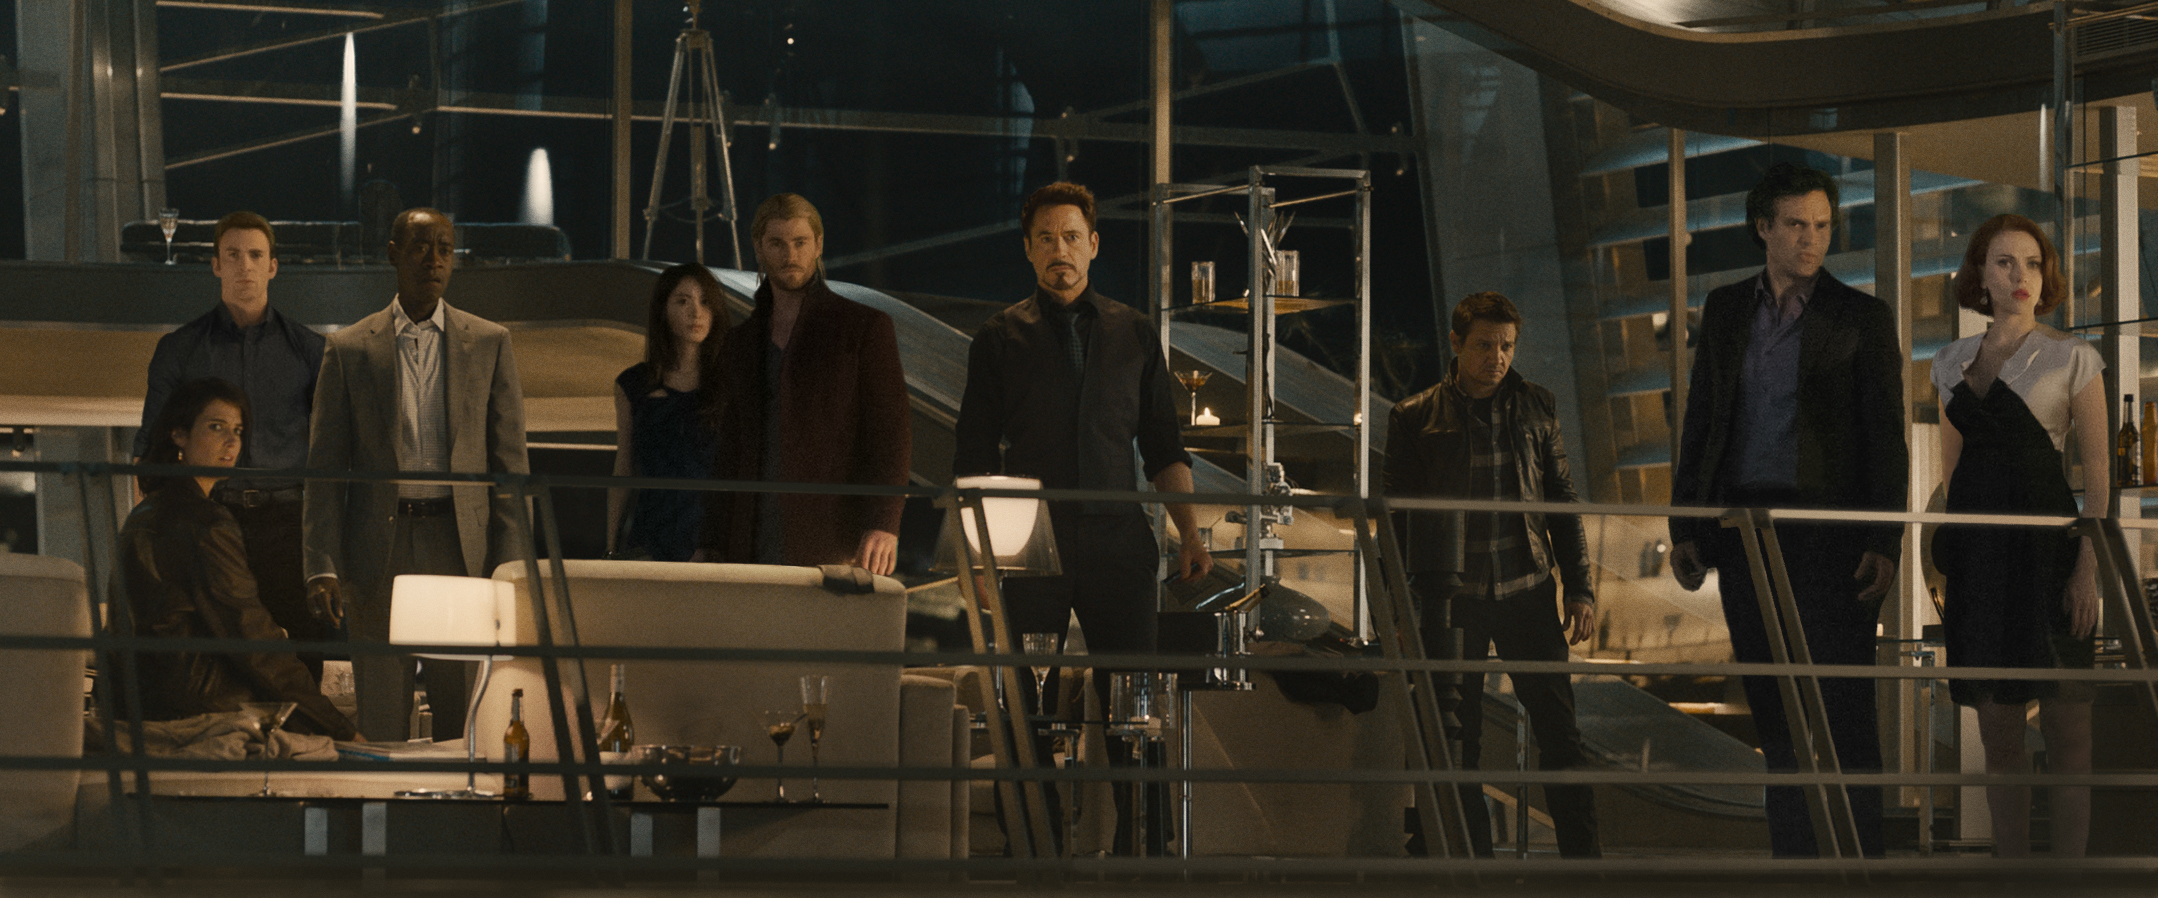 Image Result For Captain America Civil